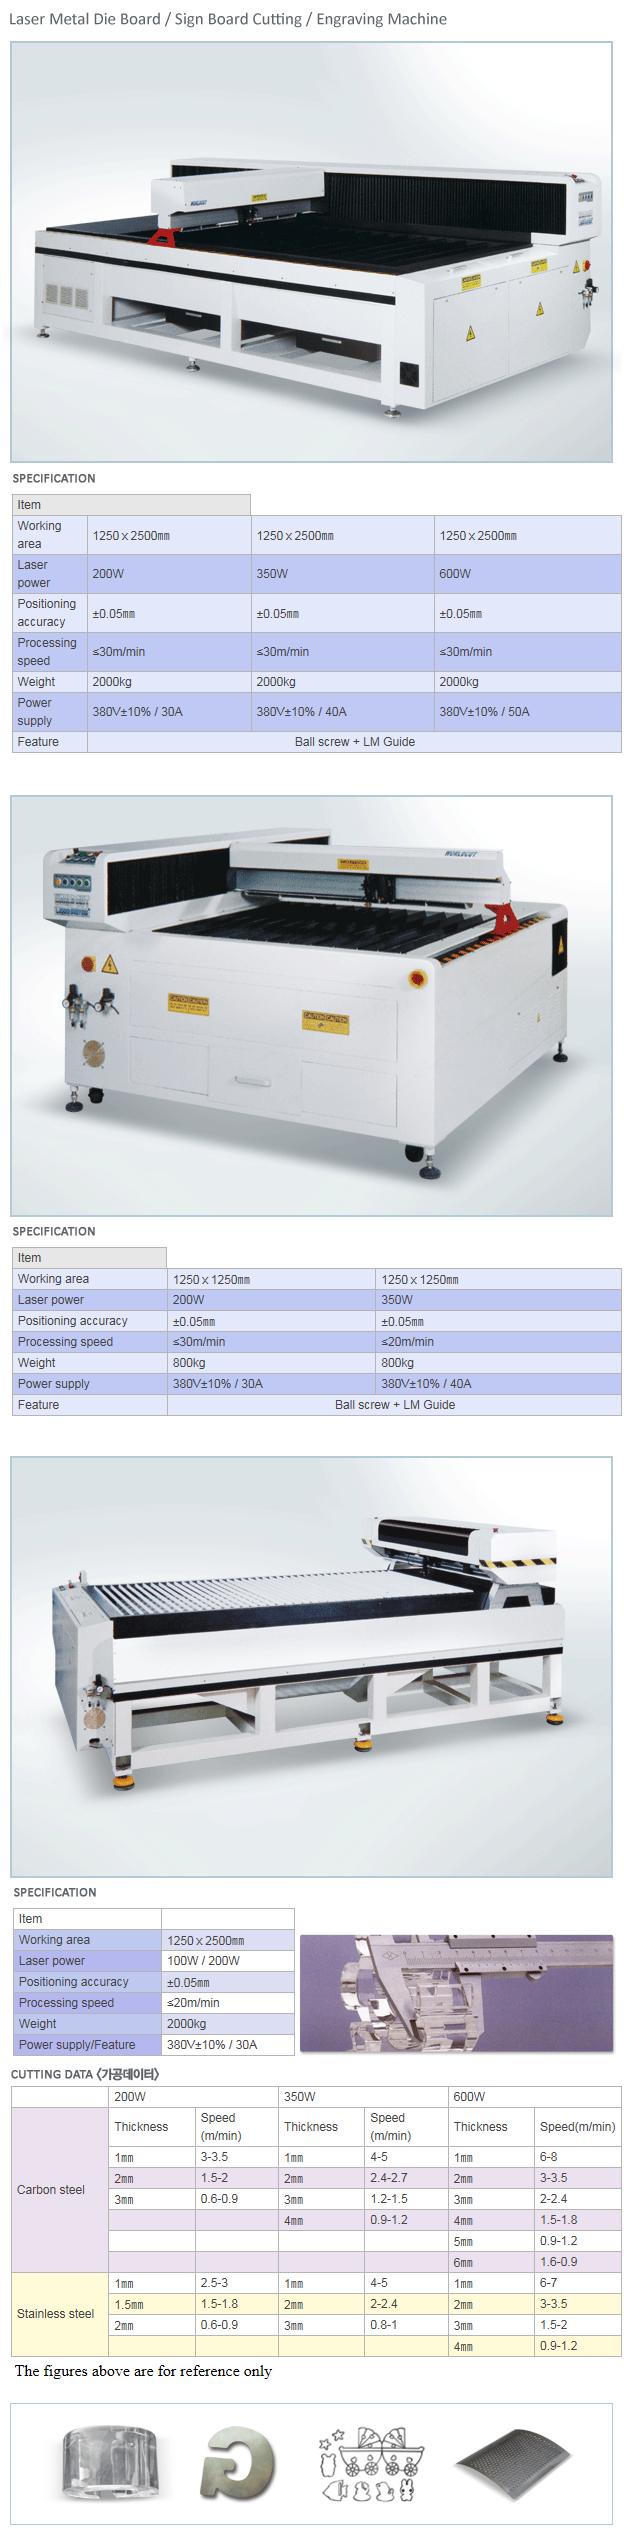 Korea Laser Tech Laser Metal Die Board / Sign Board Cutting / Engraving Machine